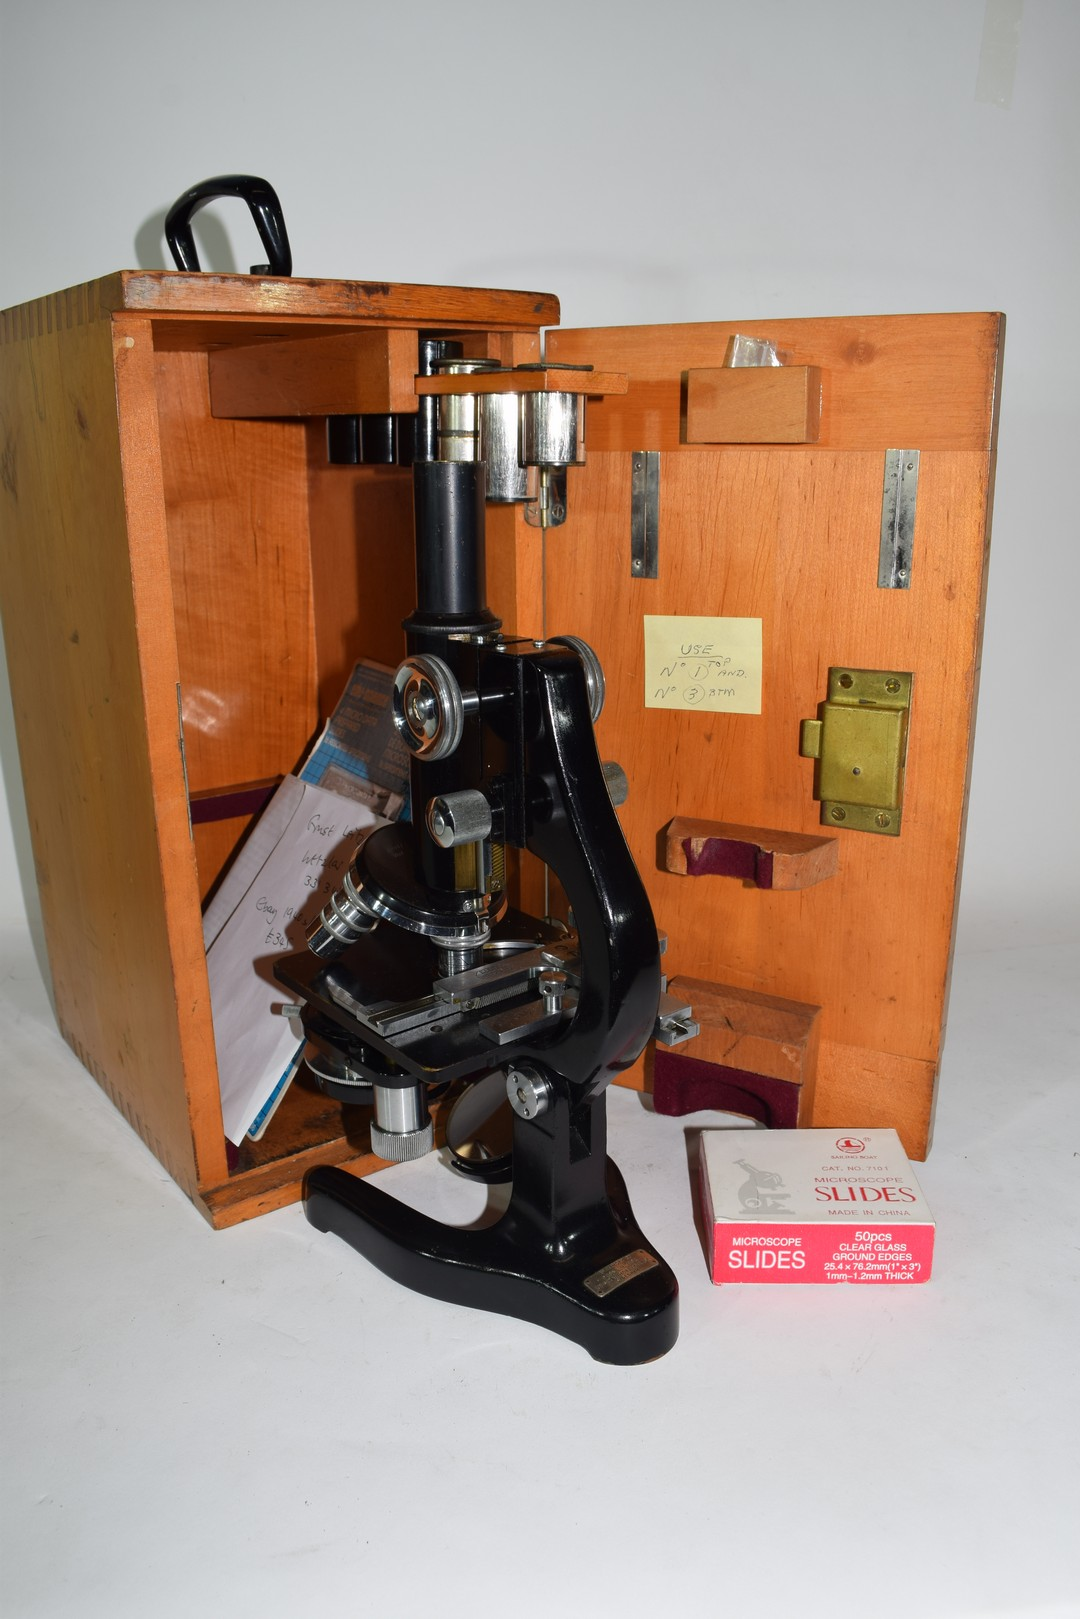 Ernst Leitz Wetzlar, 20th century microscope - Image 3 of 5